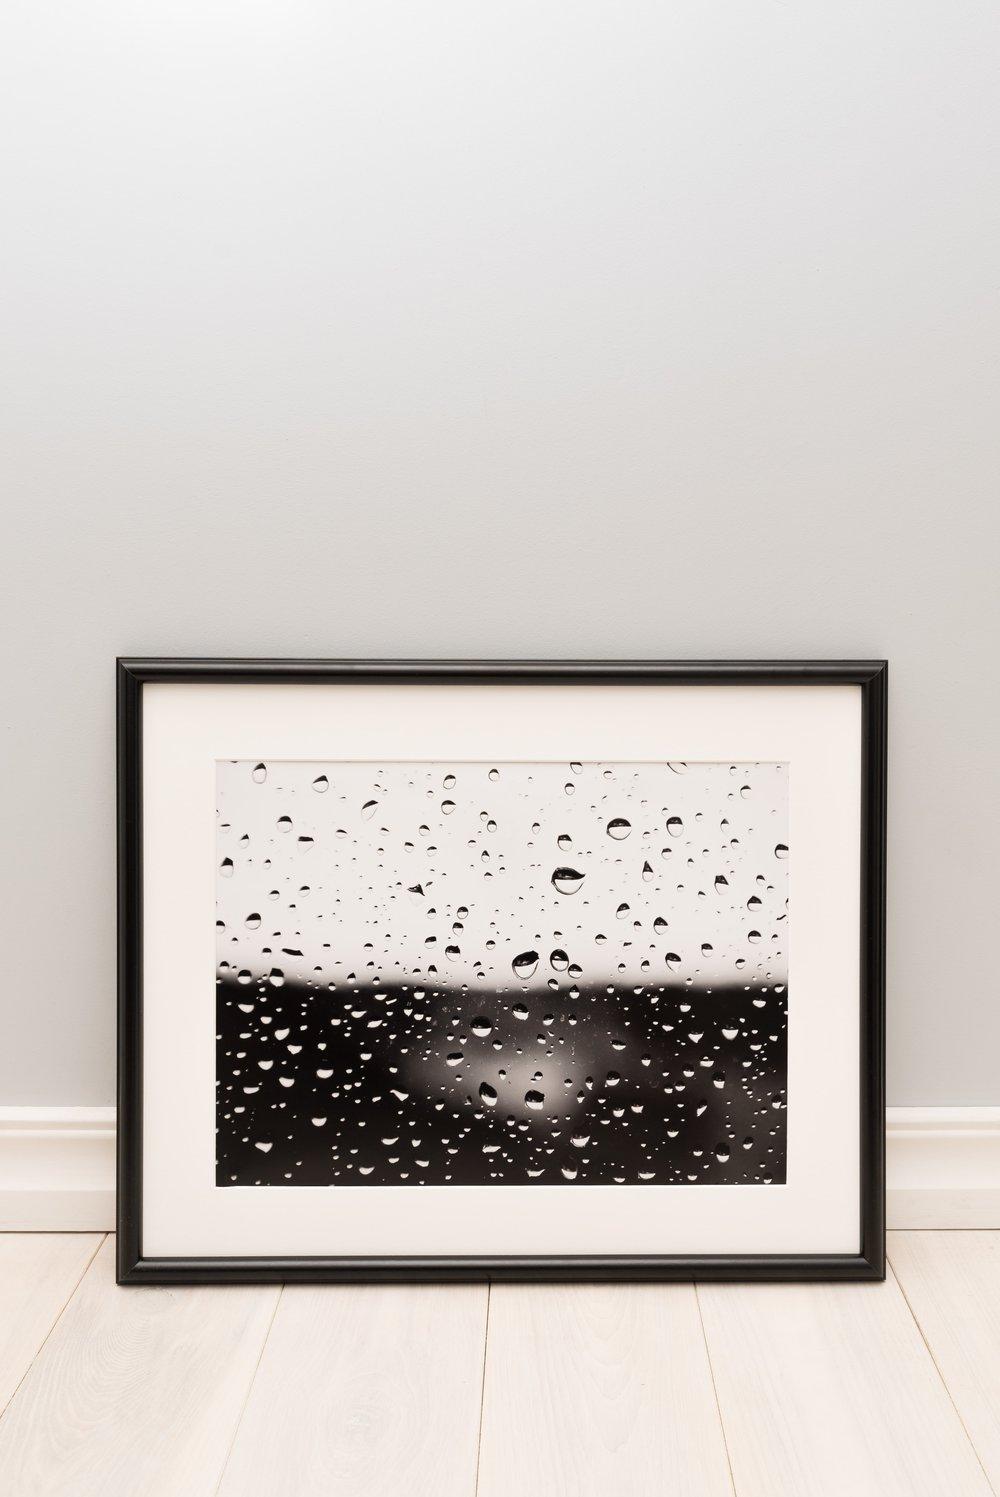 Image of Raindrops